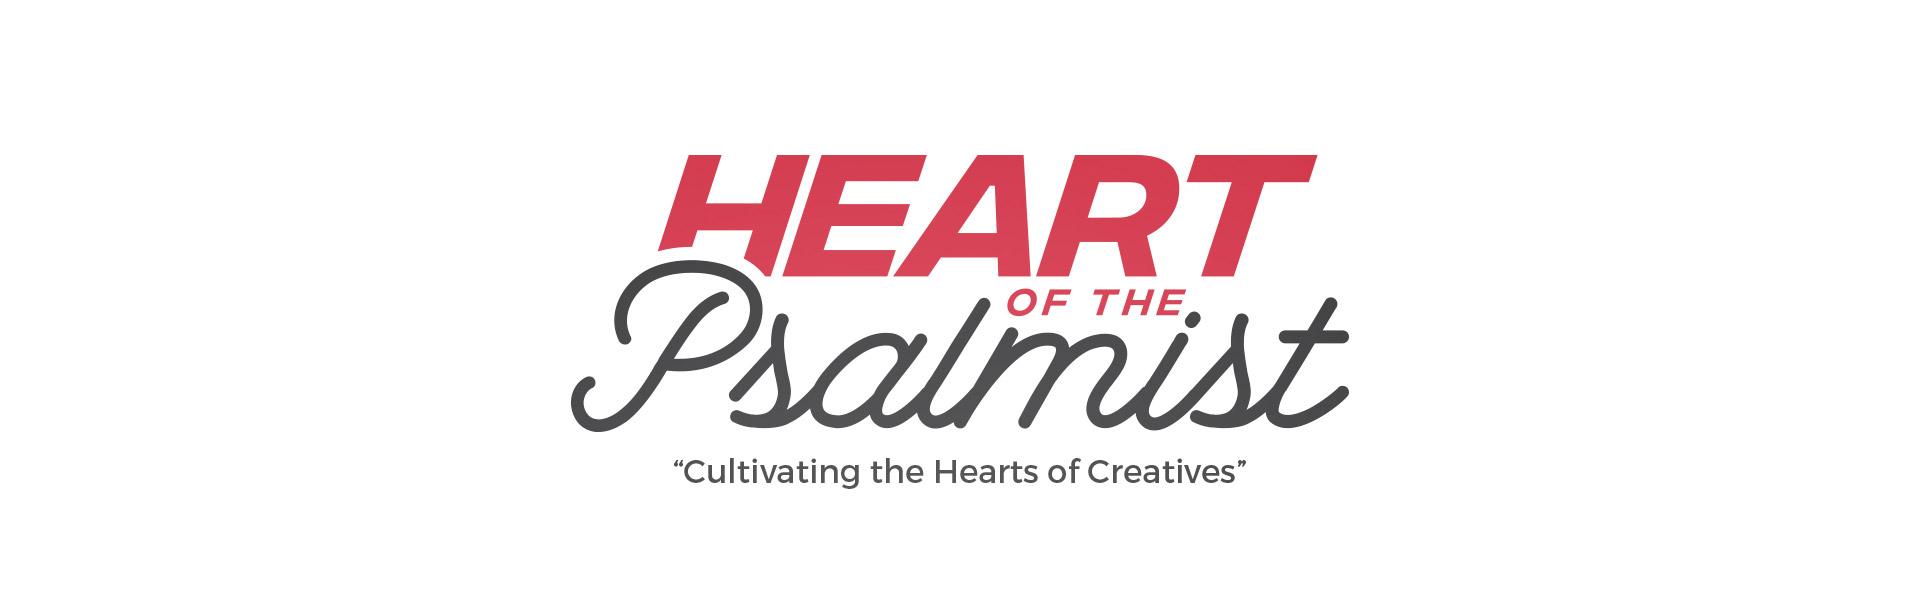 Heart of the Psalmist podcast